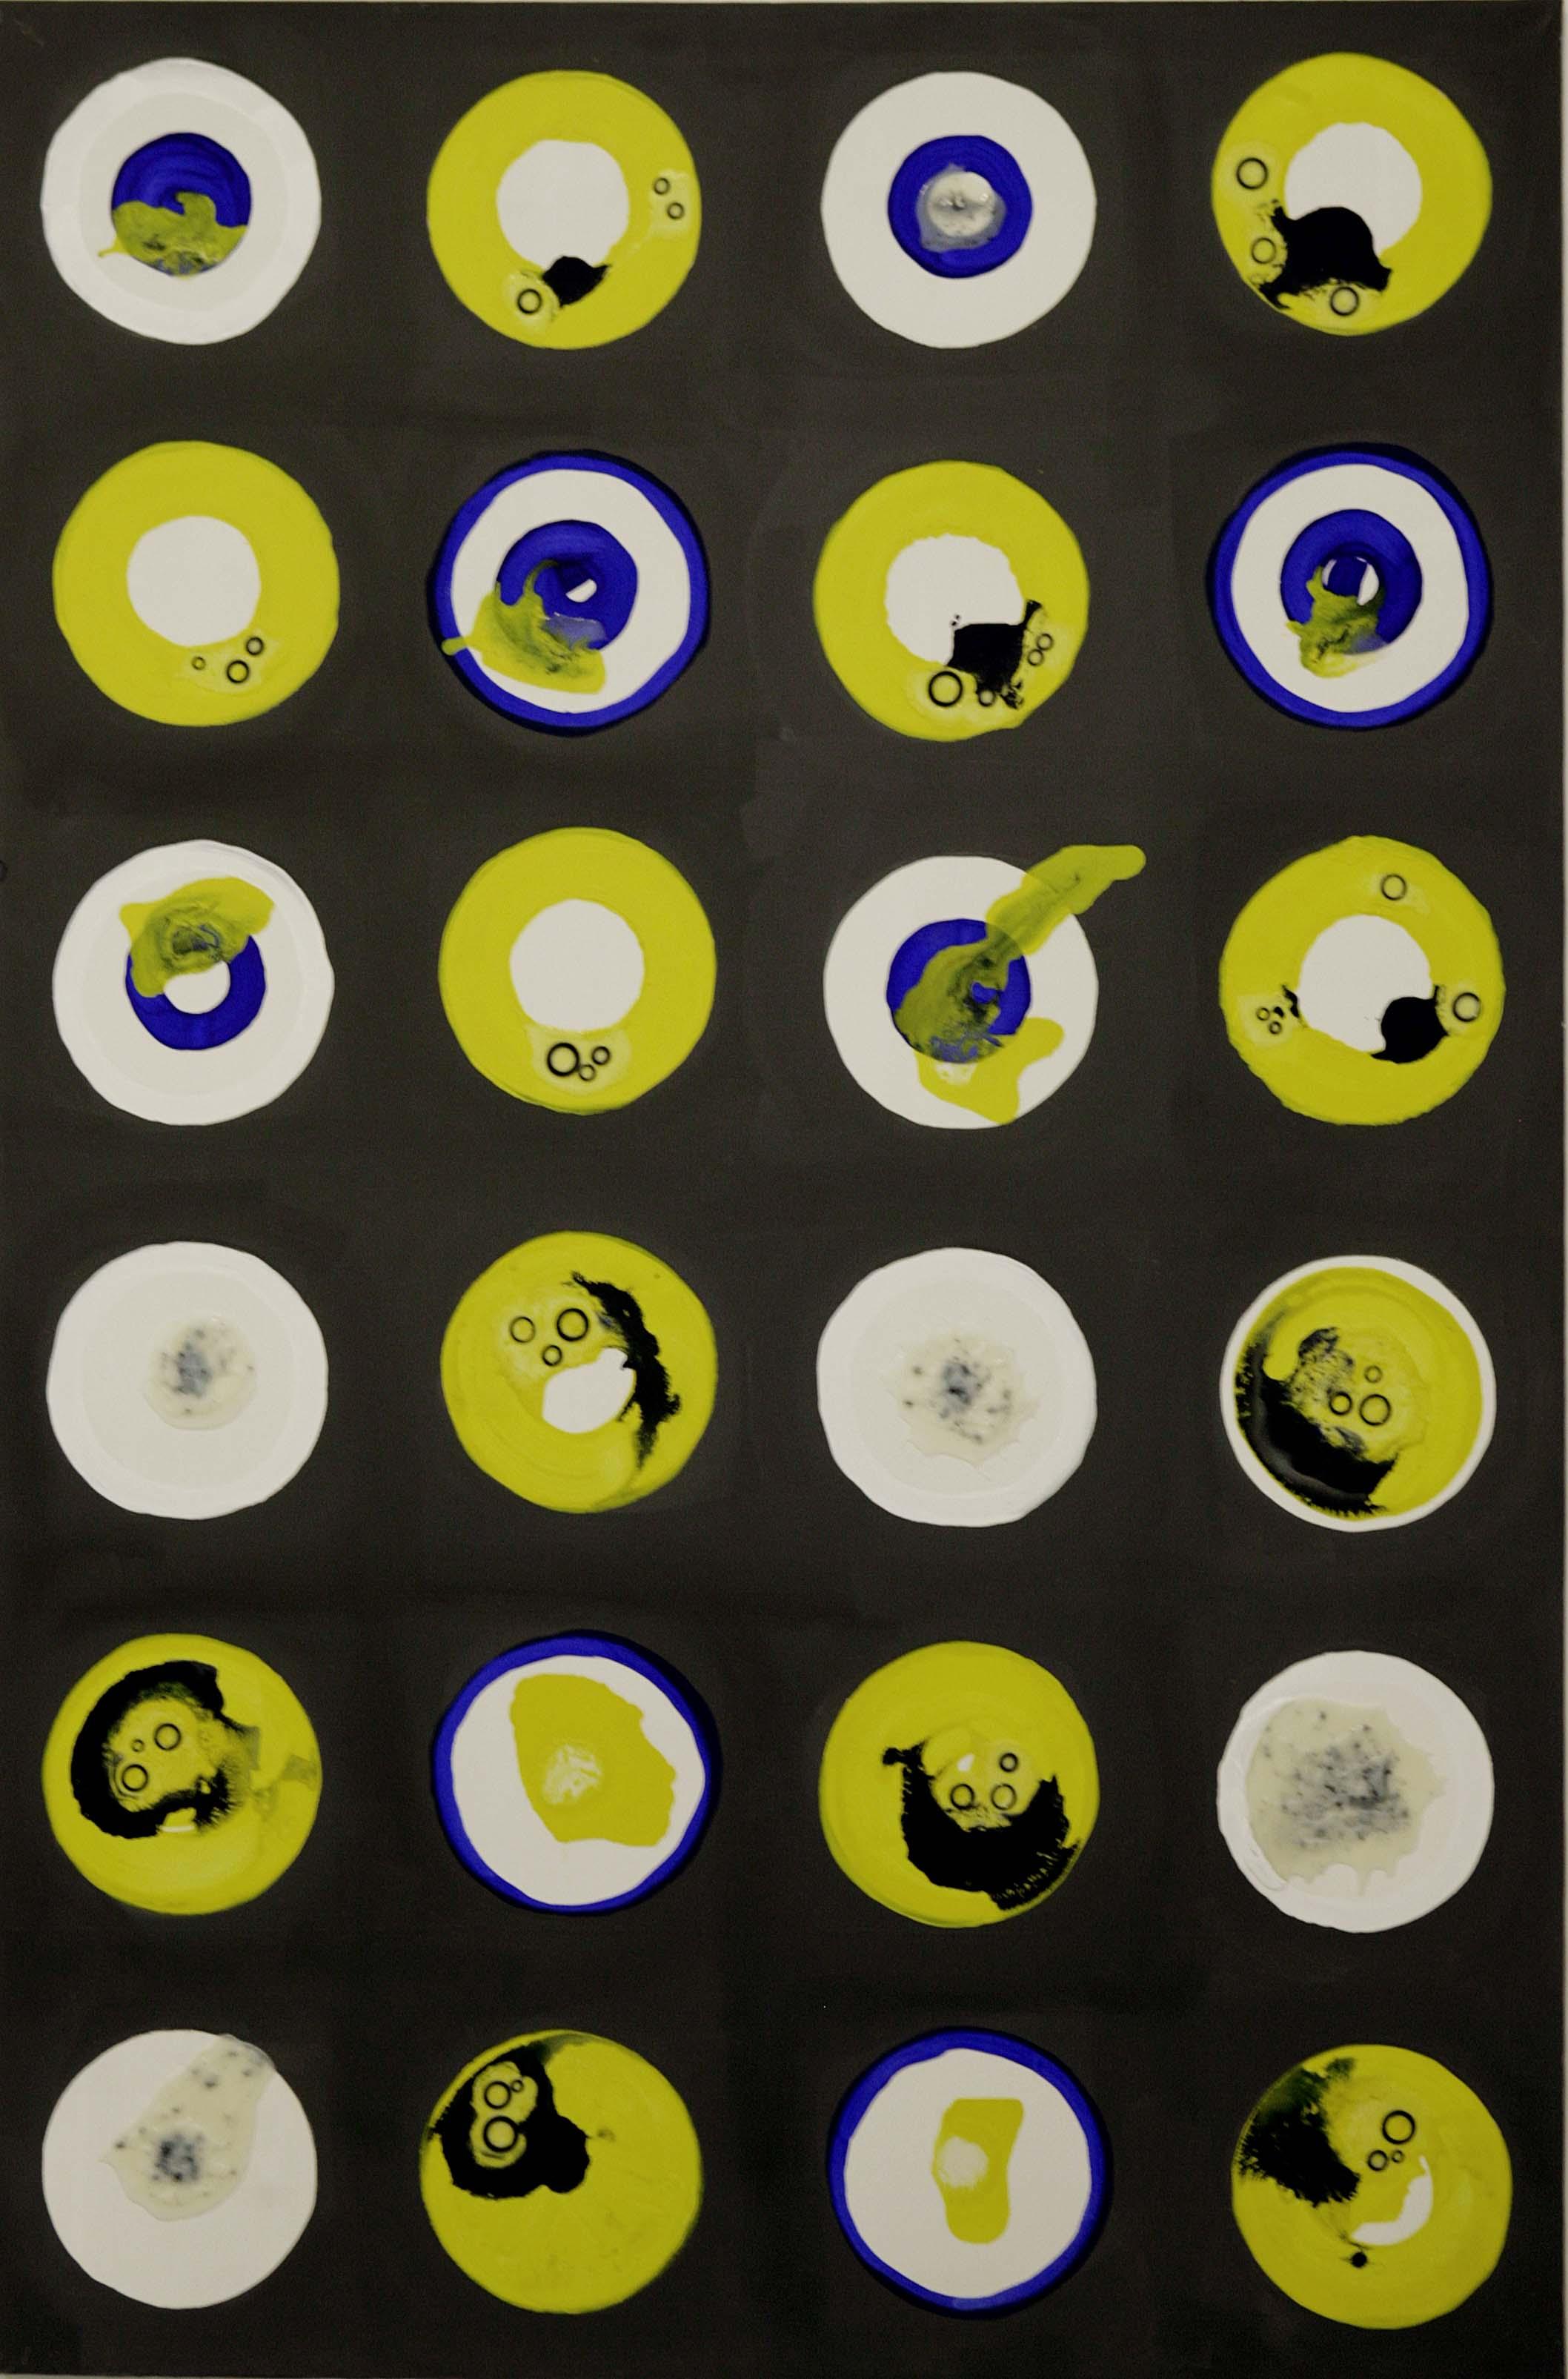 2. Untitled - cm 120 x 180 - mixed technique on canvas - photos by Dario Scialpi